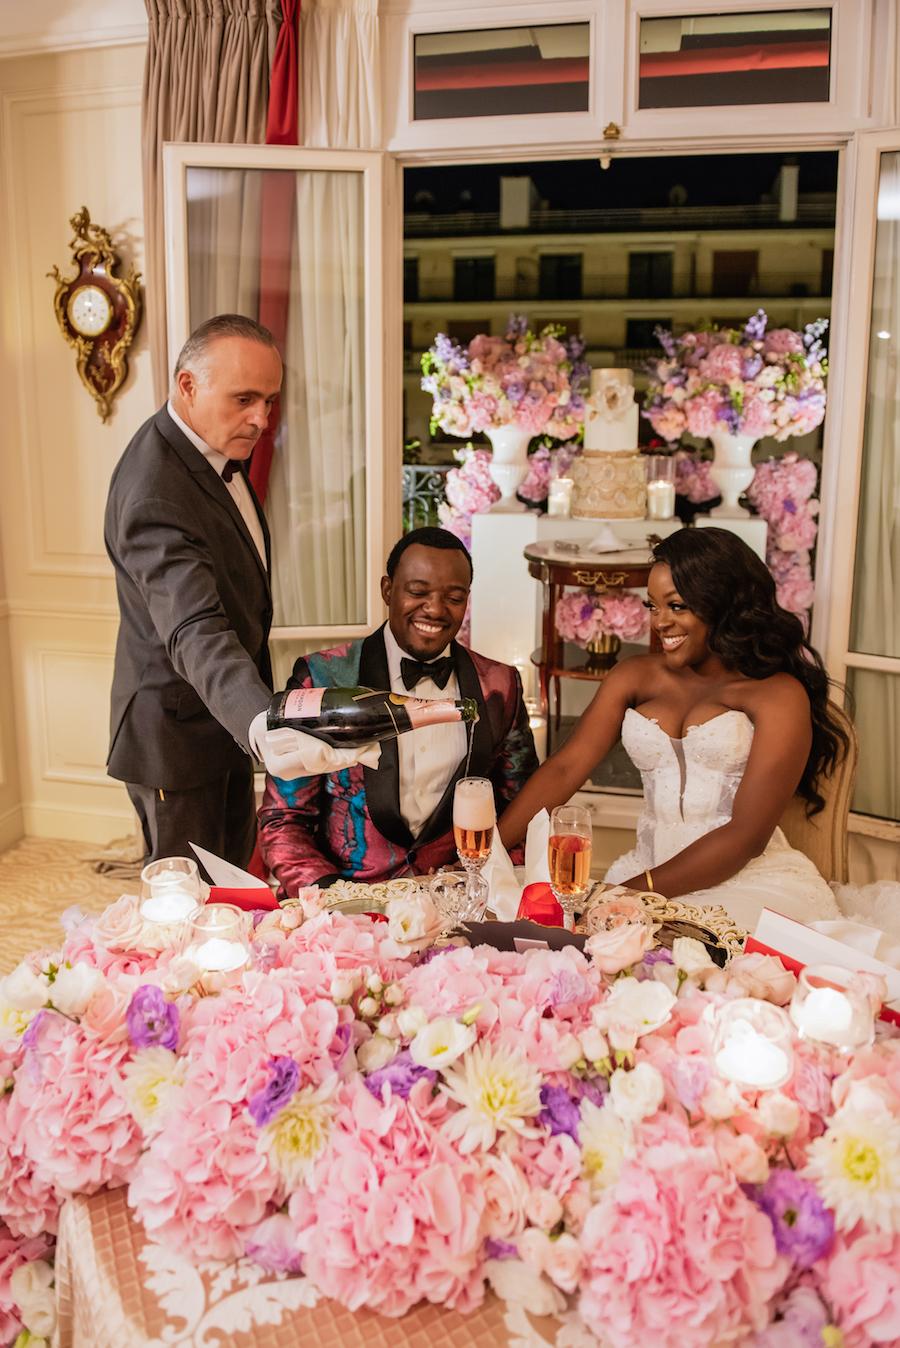 Funke-and-Jide_wedding_fall-2018_munaluchi-bride-magazine_munaluchi_decor_fashion_bridal_gown_paris_france_paris-wedding_multicultural-love44-1.jpg